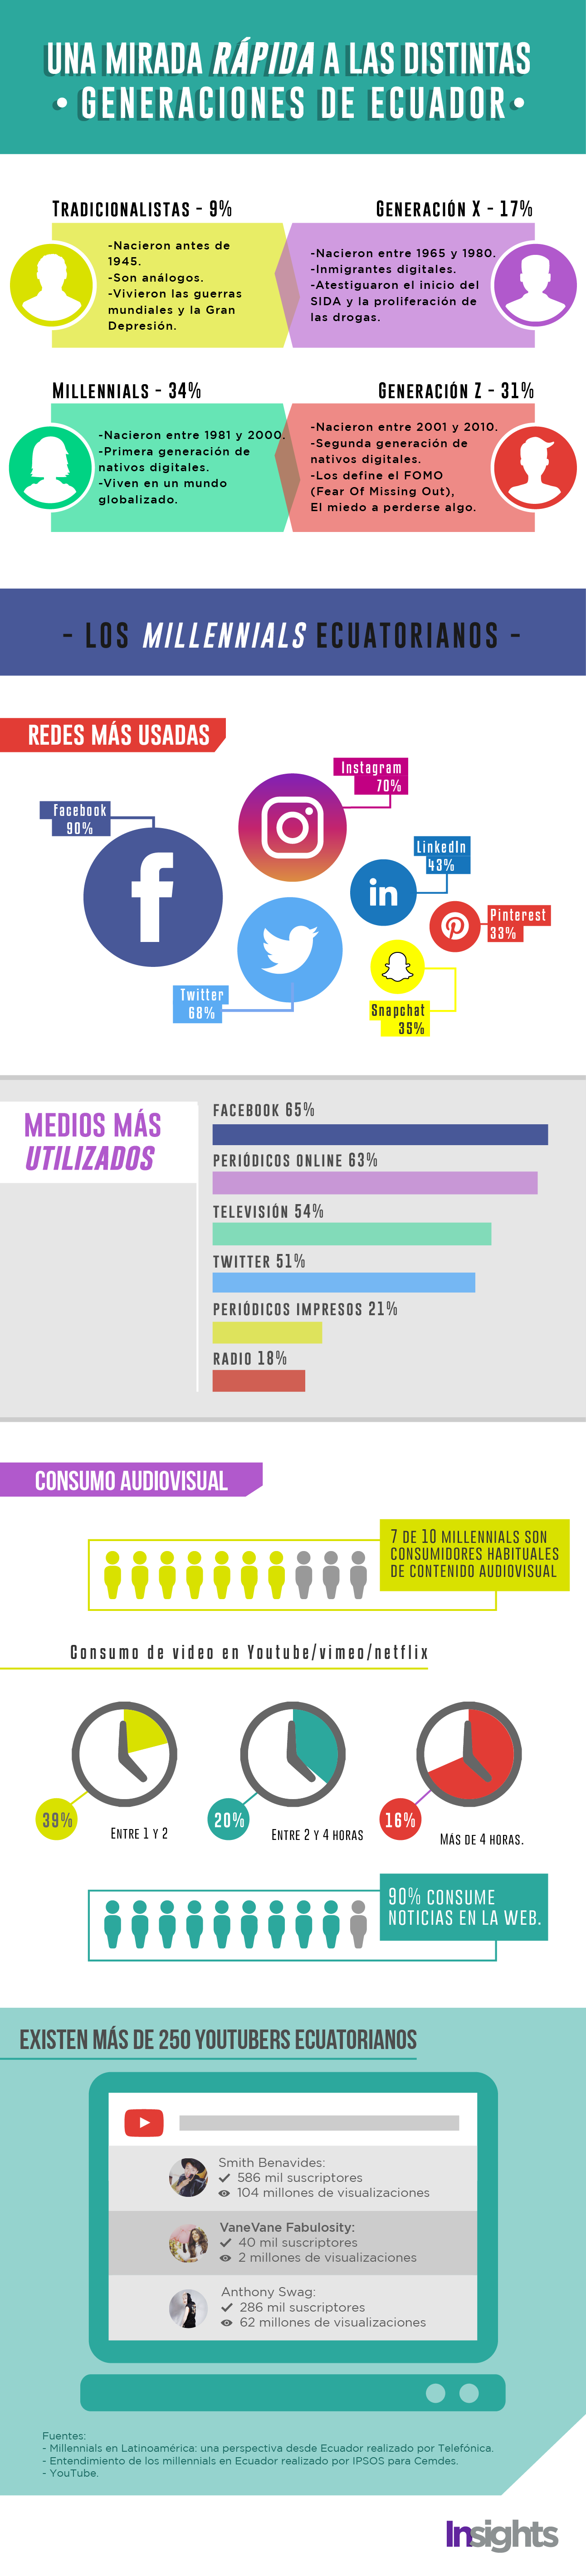 Generaciones Millenials Ecuador 2017